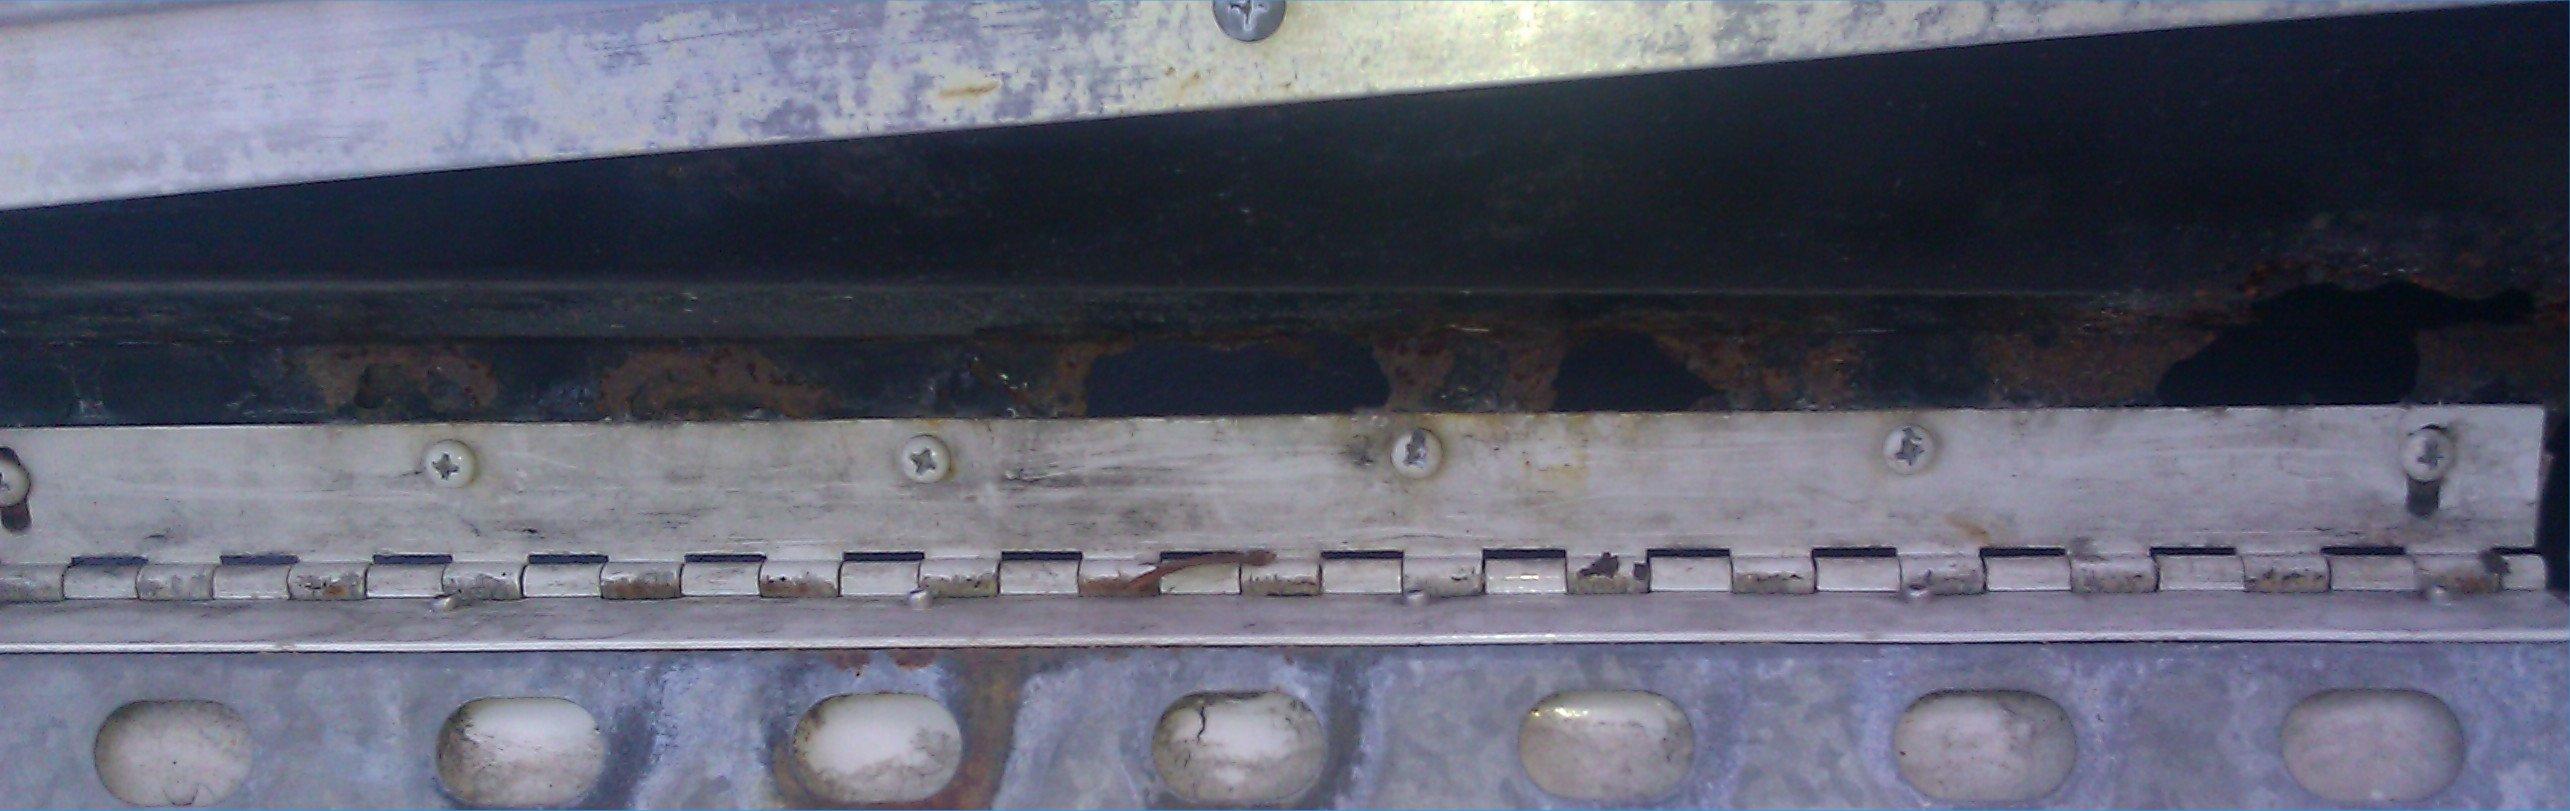 Rialta RV Problems: Overheating, Dead Batteries, Rust